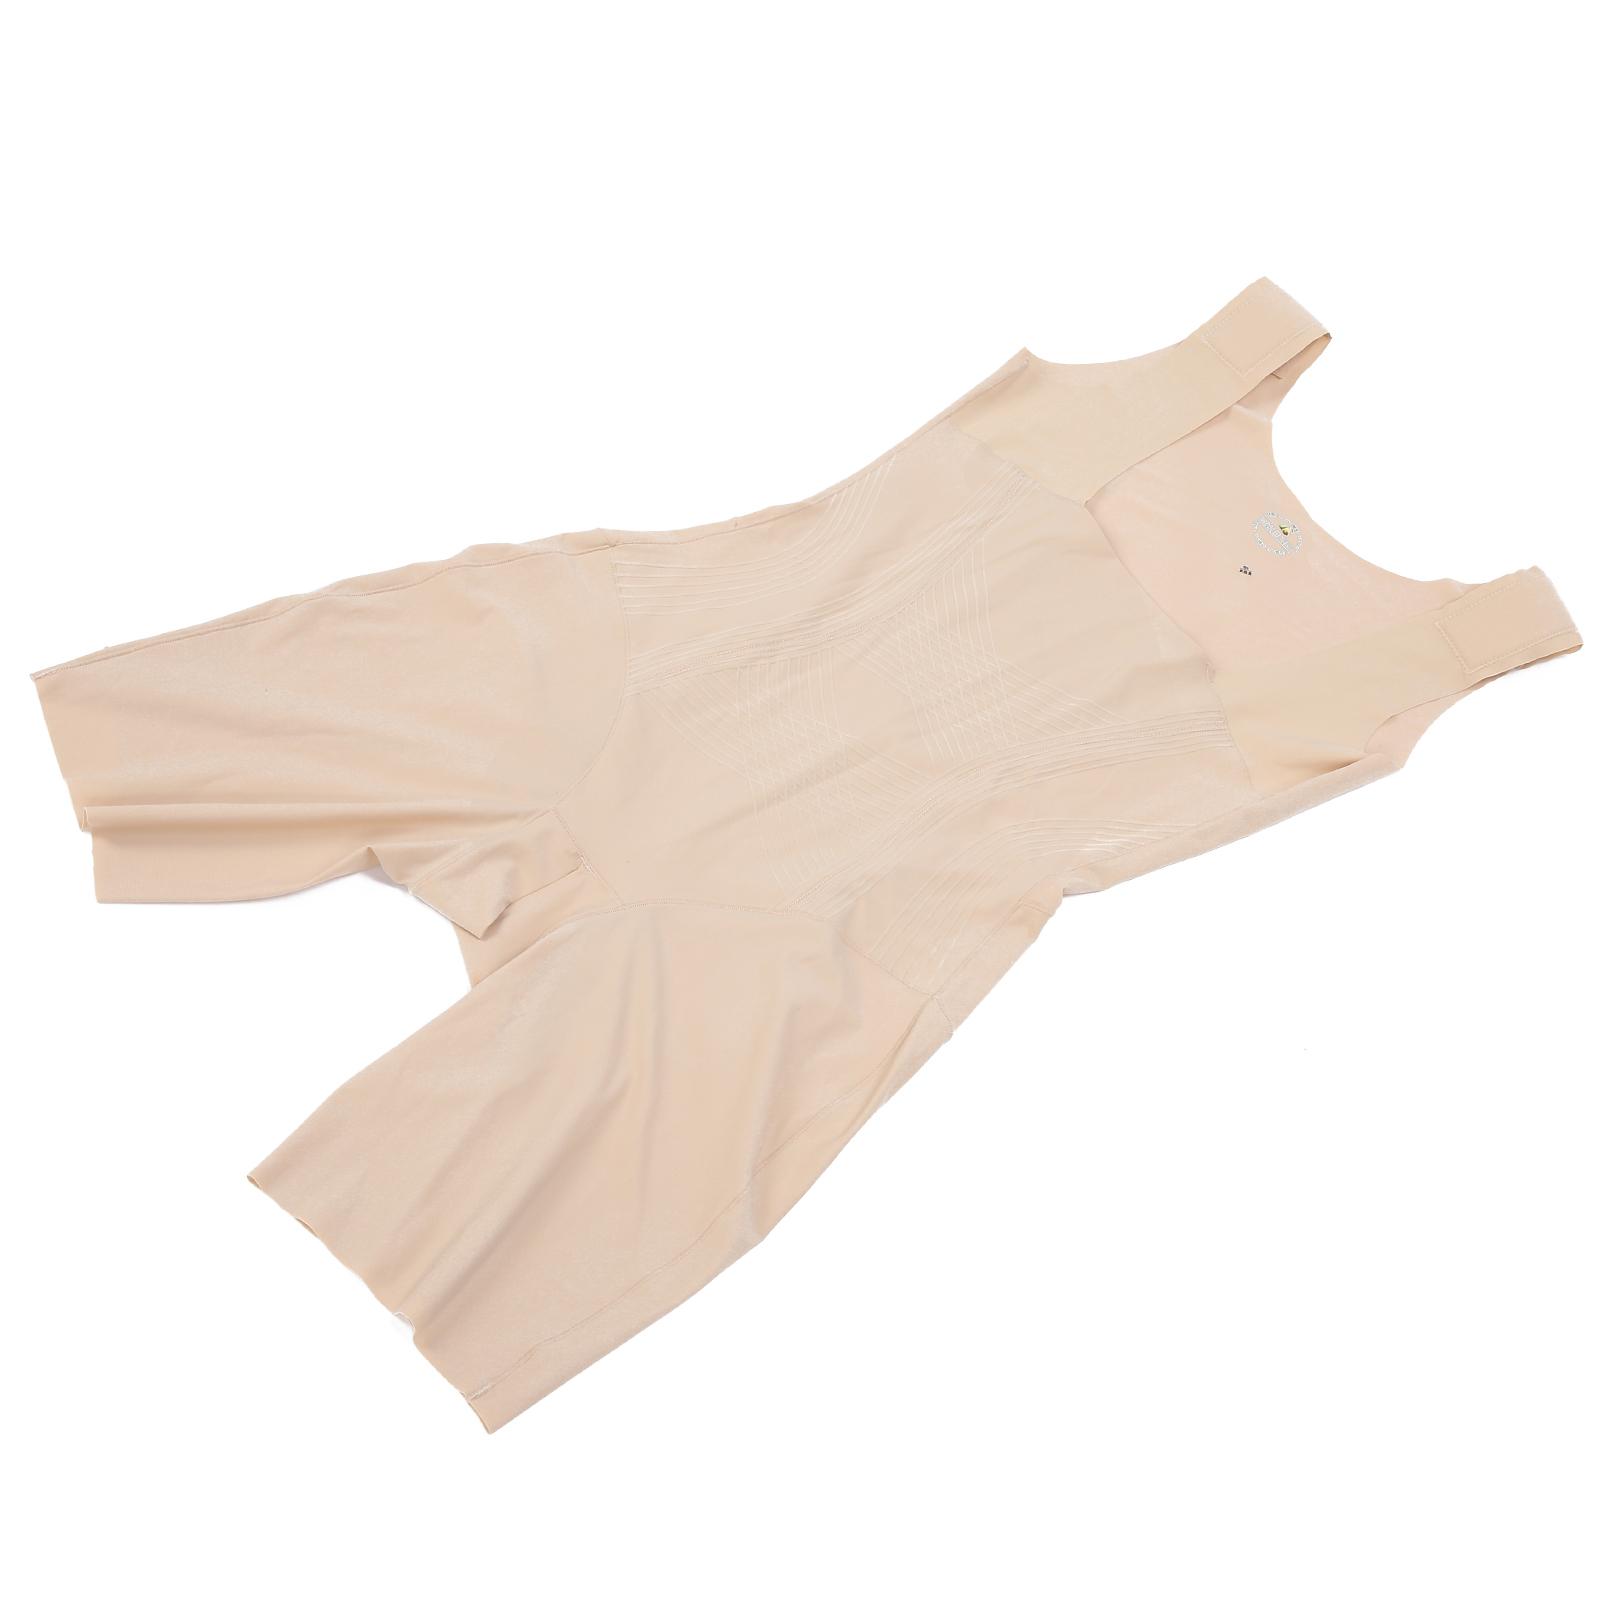 miniature 21 - Women's Full Body Taille Trainer Shaper Taille Corset underbust corset shapewear